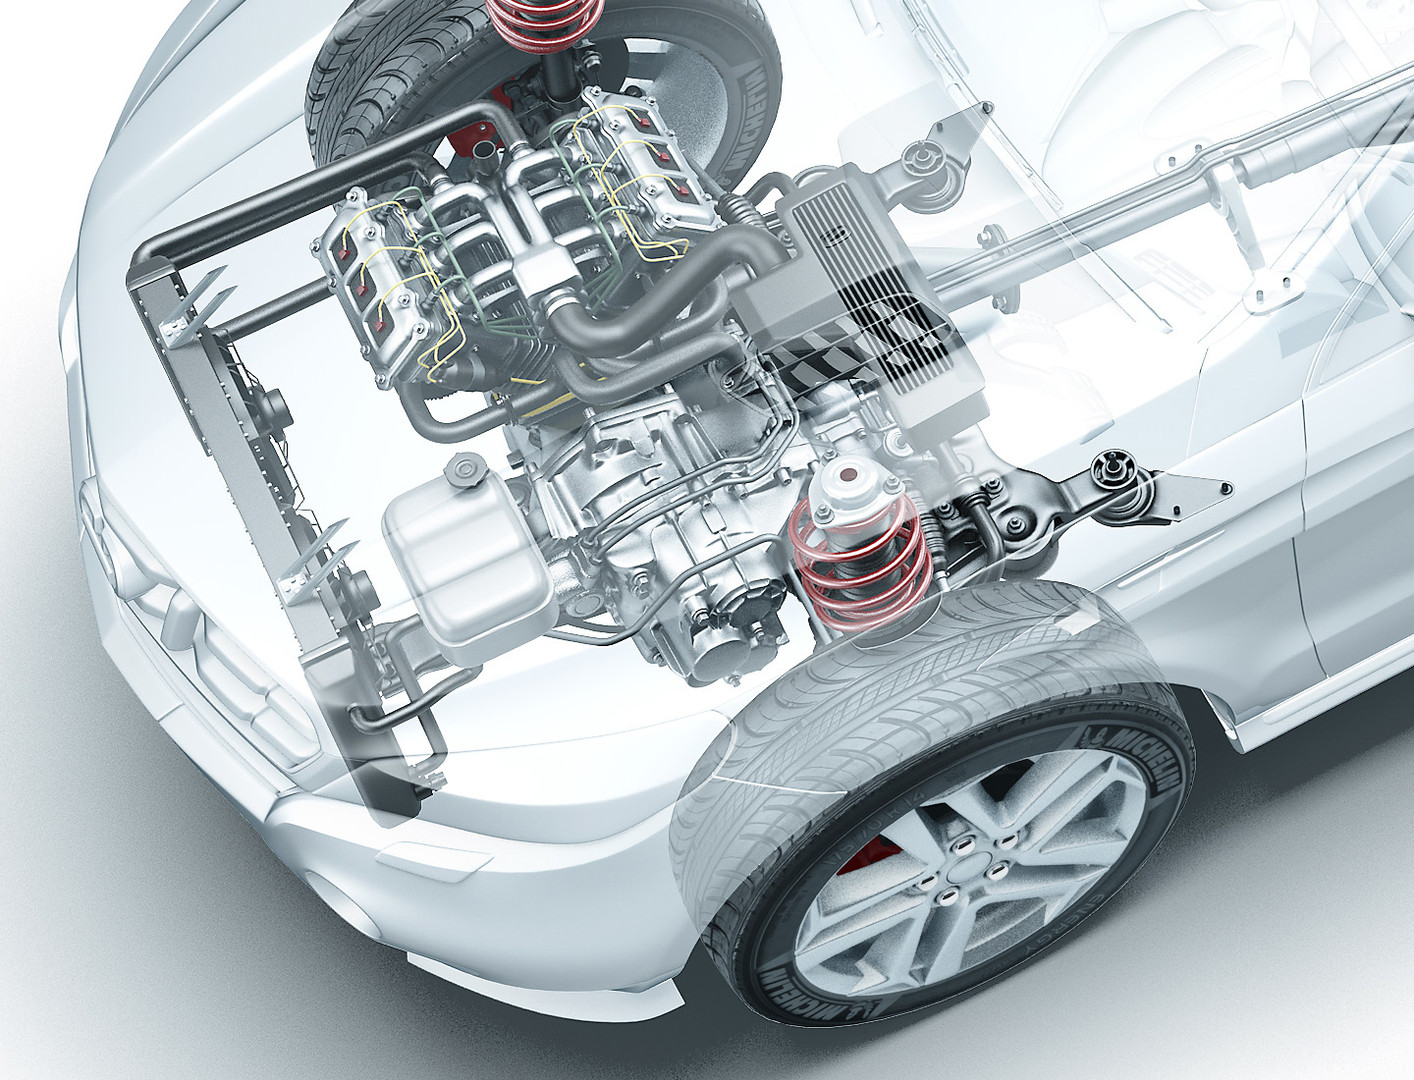 automotor-transparente-illustration.jpg